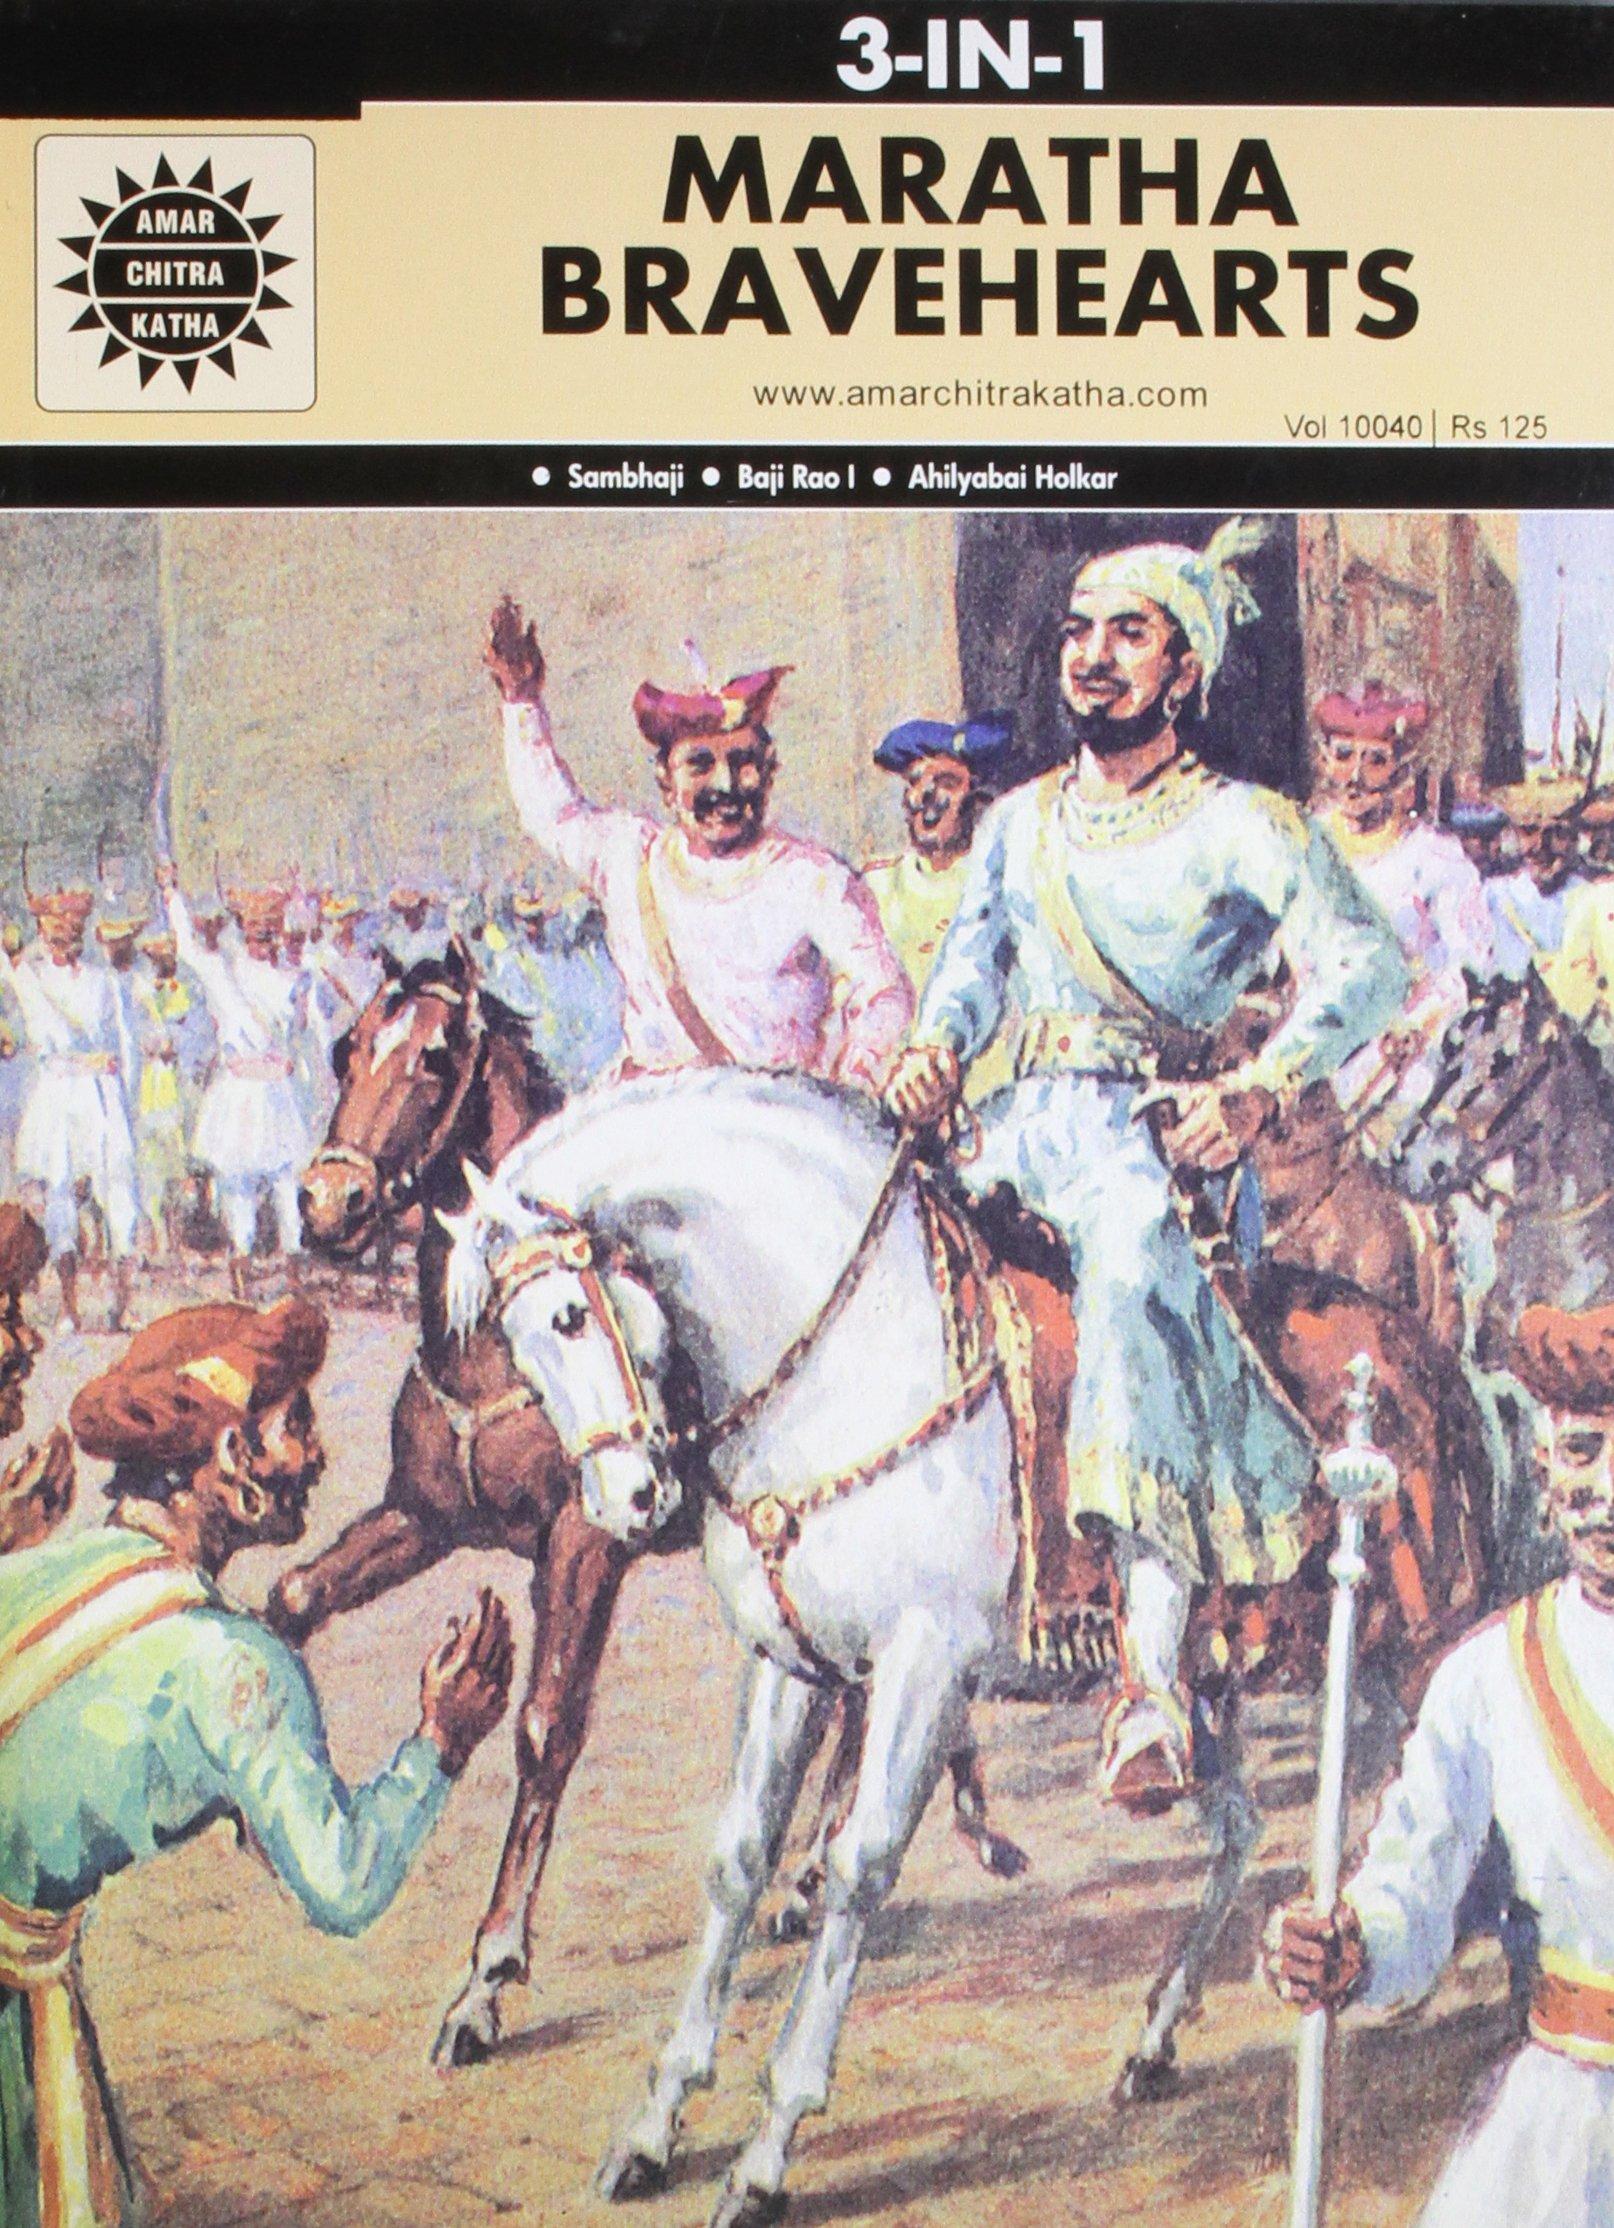 Download Maratha Bravehearts (10040) 3 in 1 Series pdf